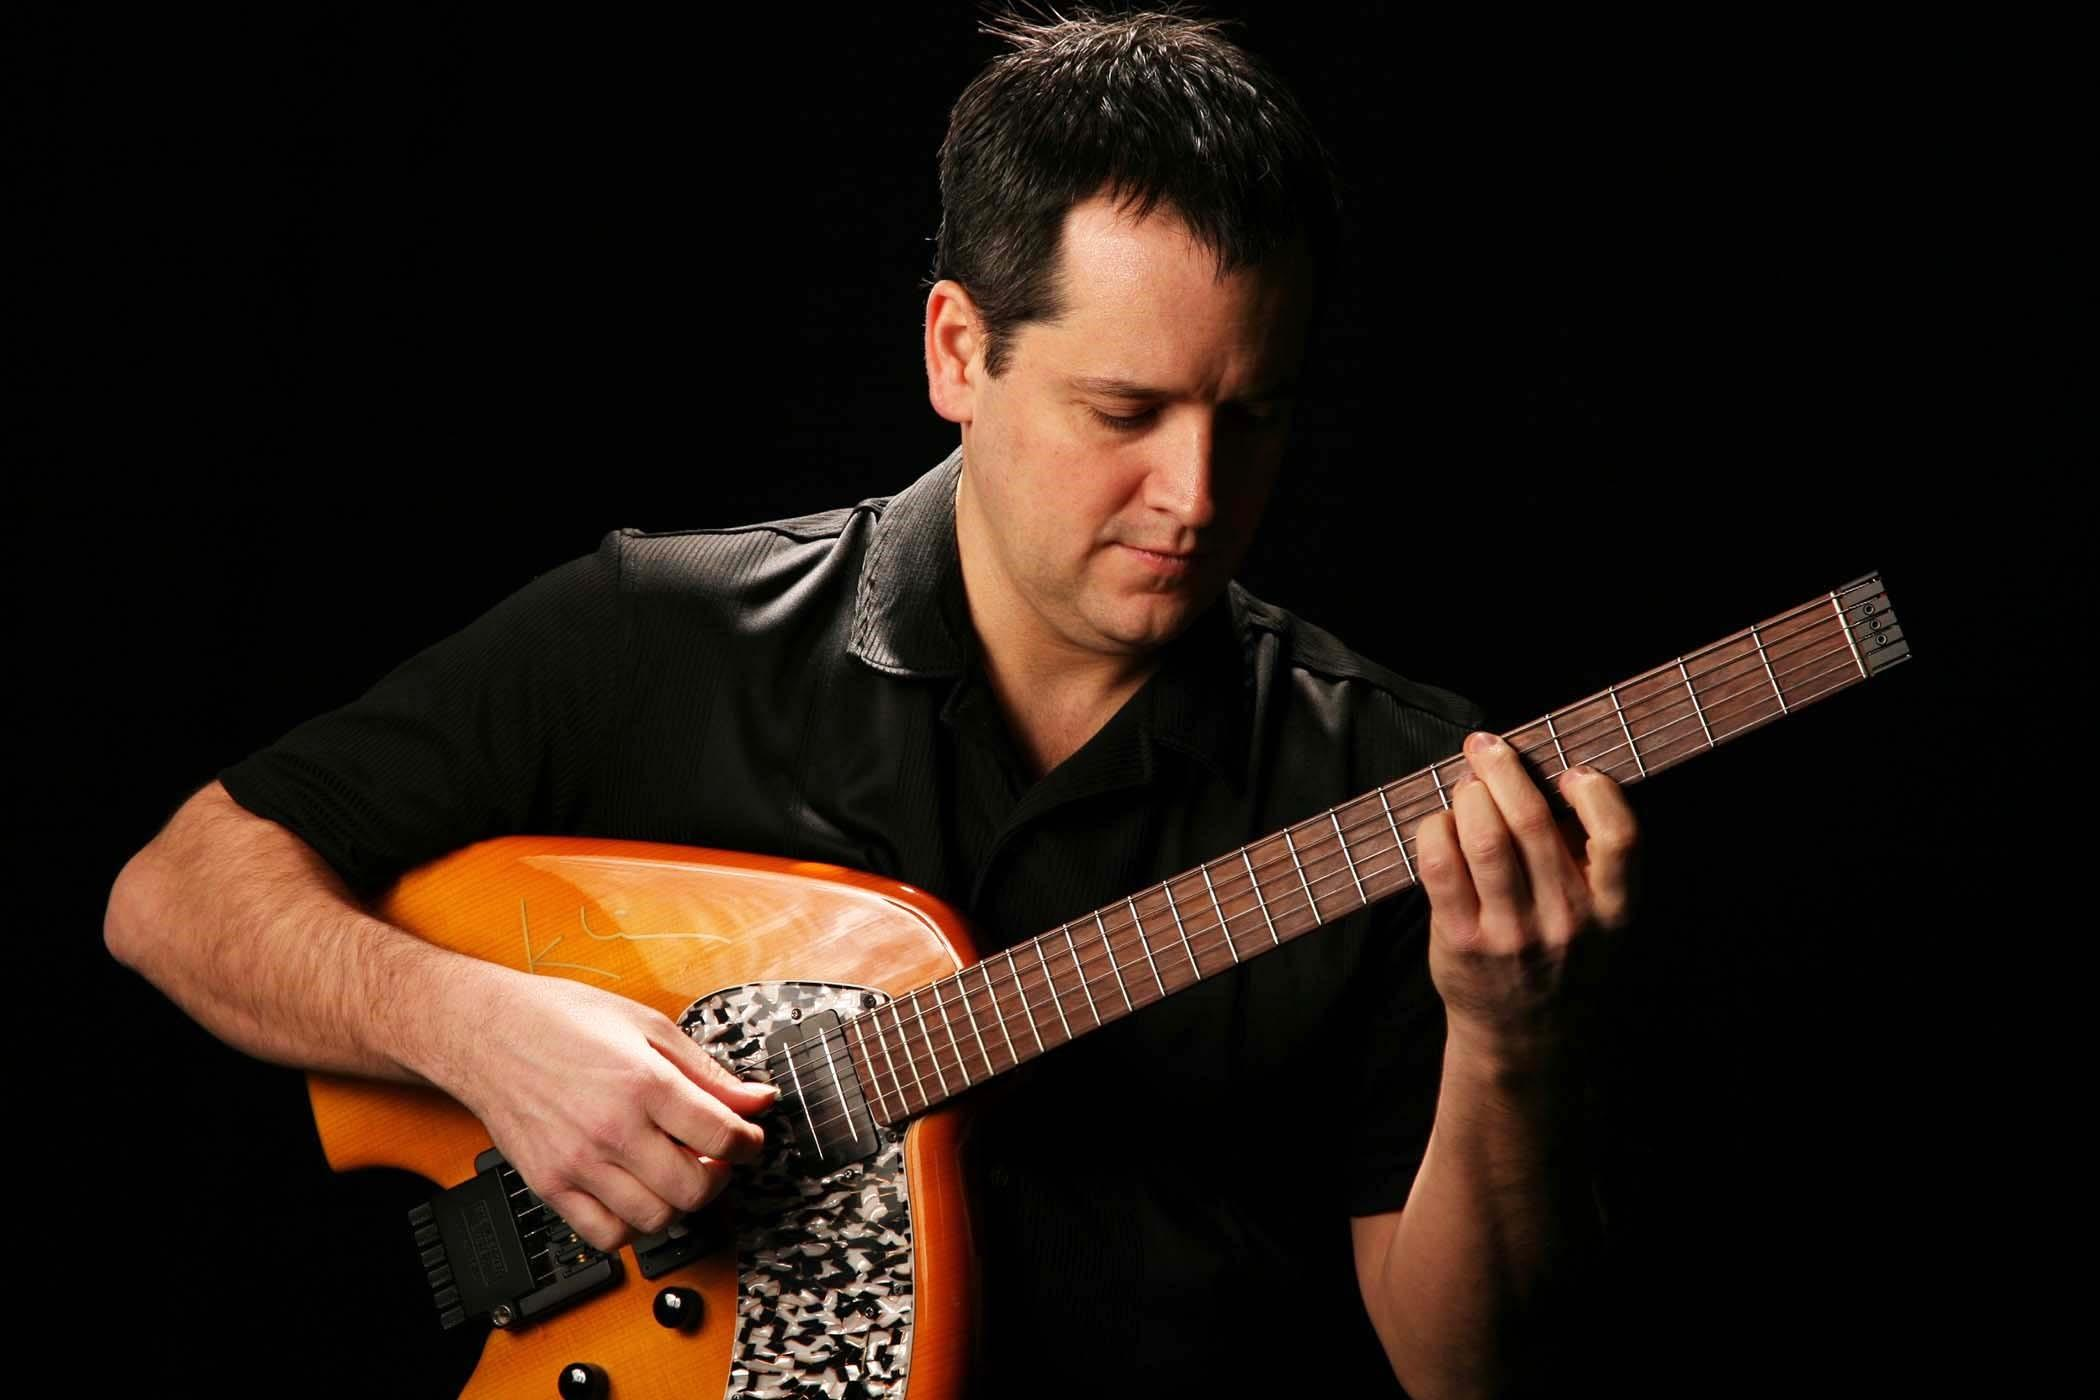 Musician Tom Lagana romancing his guitar.